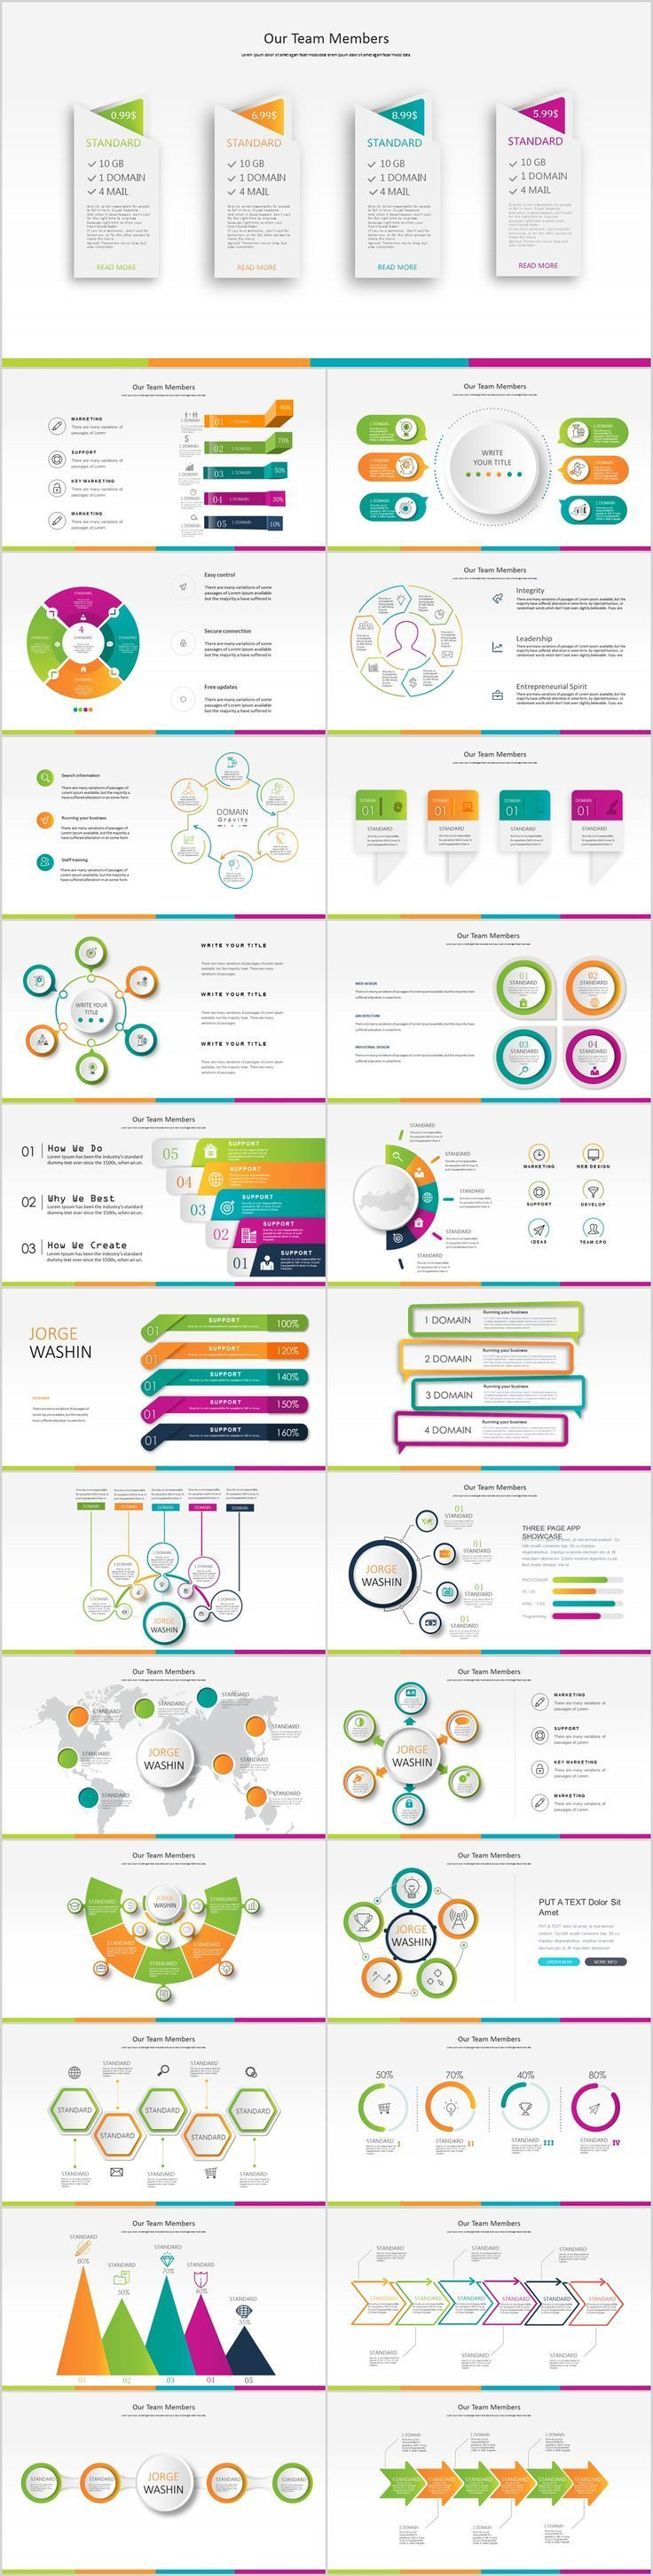 Business infographic business infographic 27 red business year business infographic data visualisation business infographic 27 red business year plan powerpoint template on toneelgroepblik Images